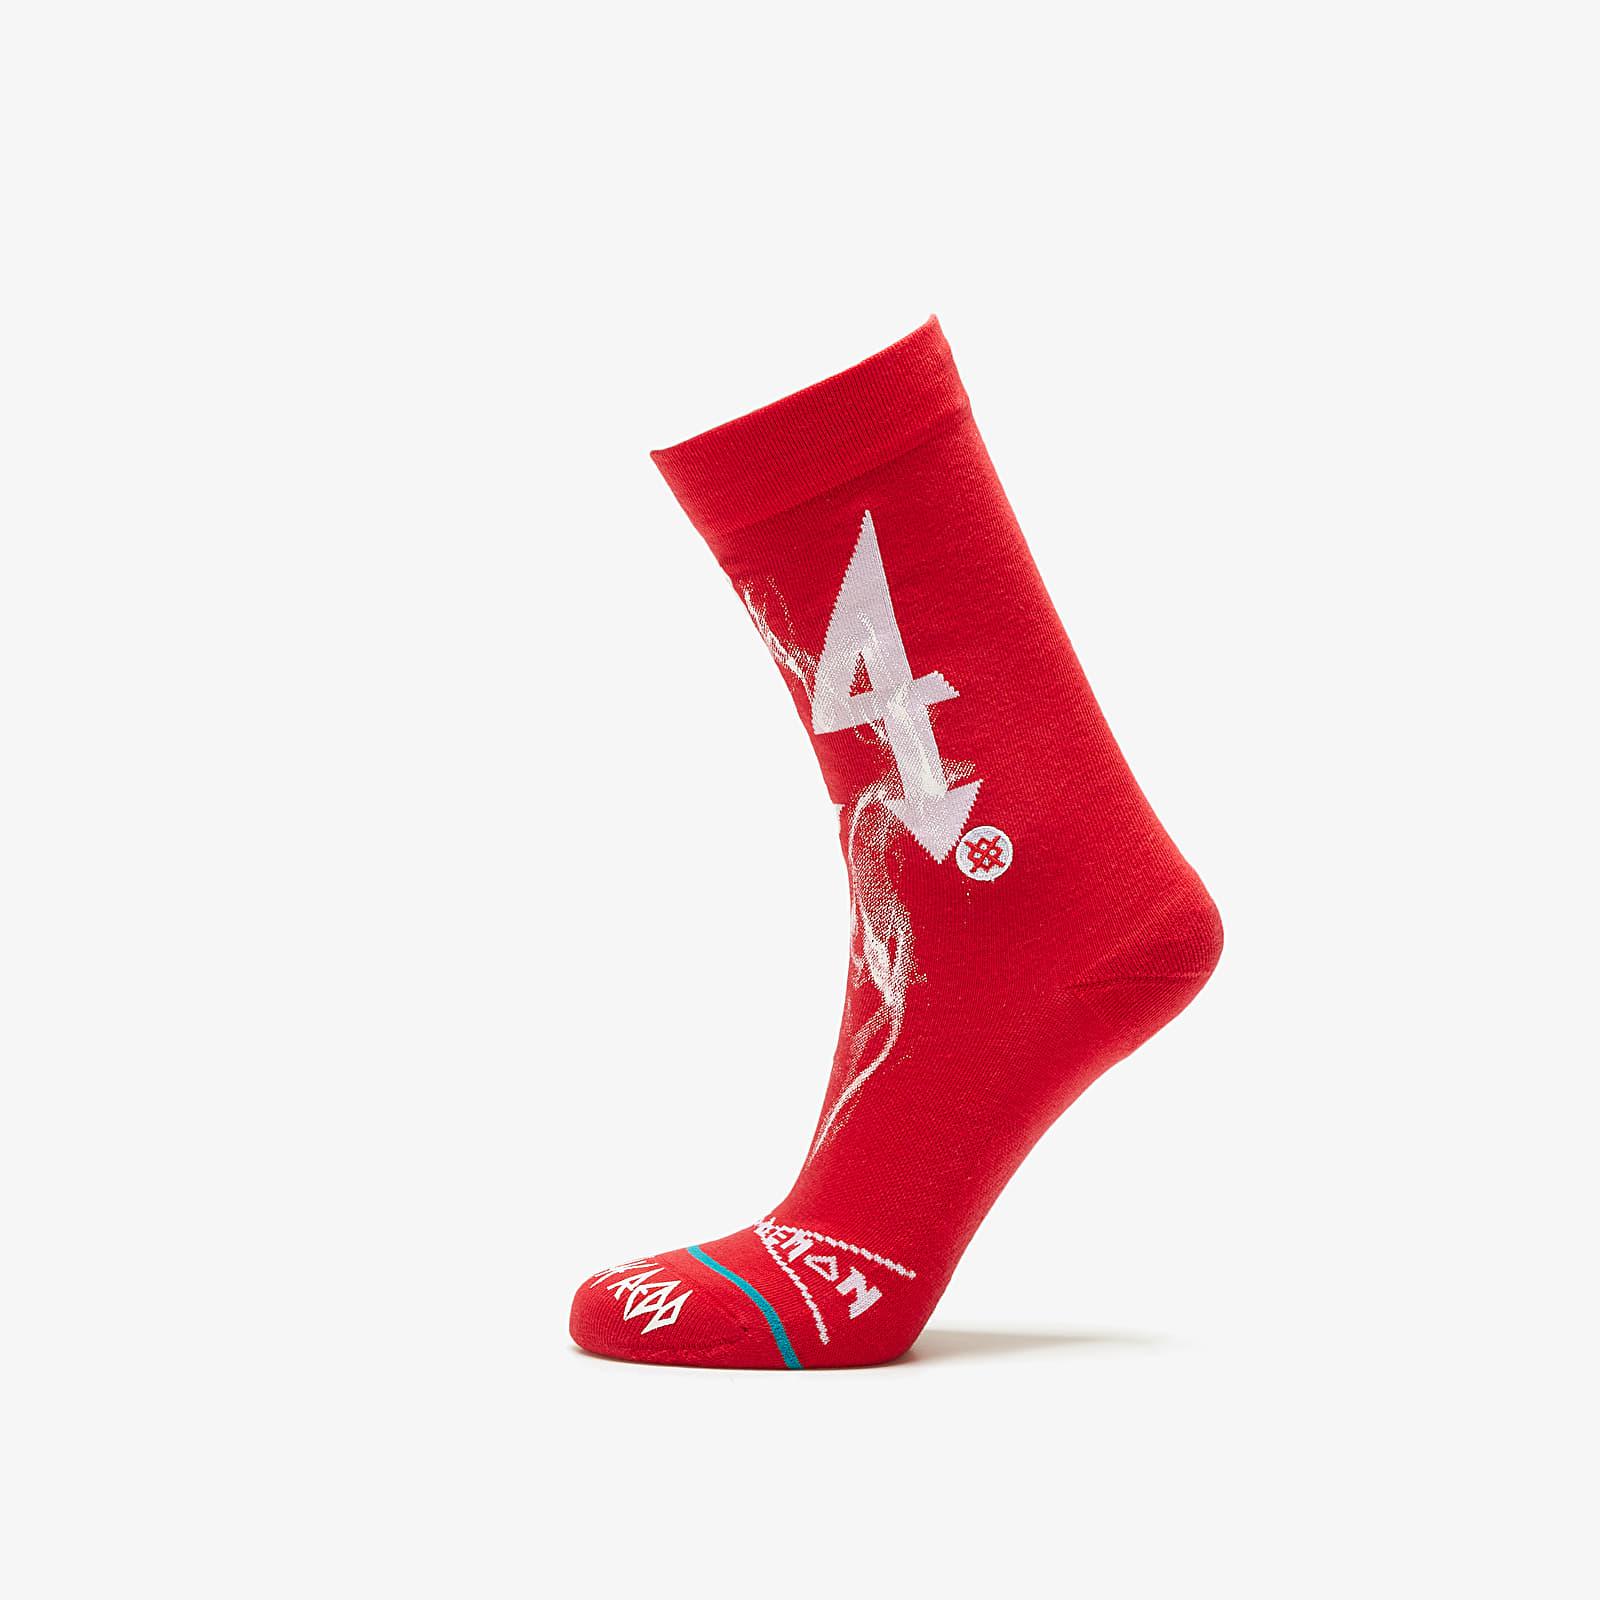 Socks Stance x Trippie Redd Trippie Socks Red